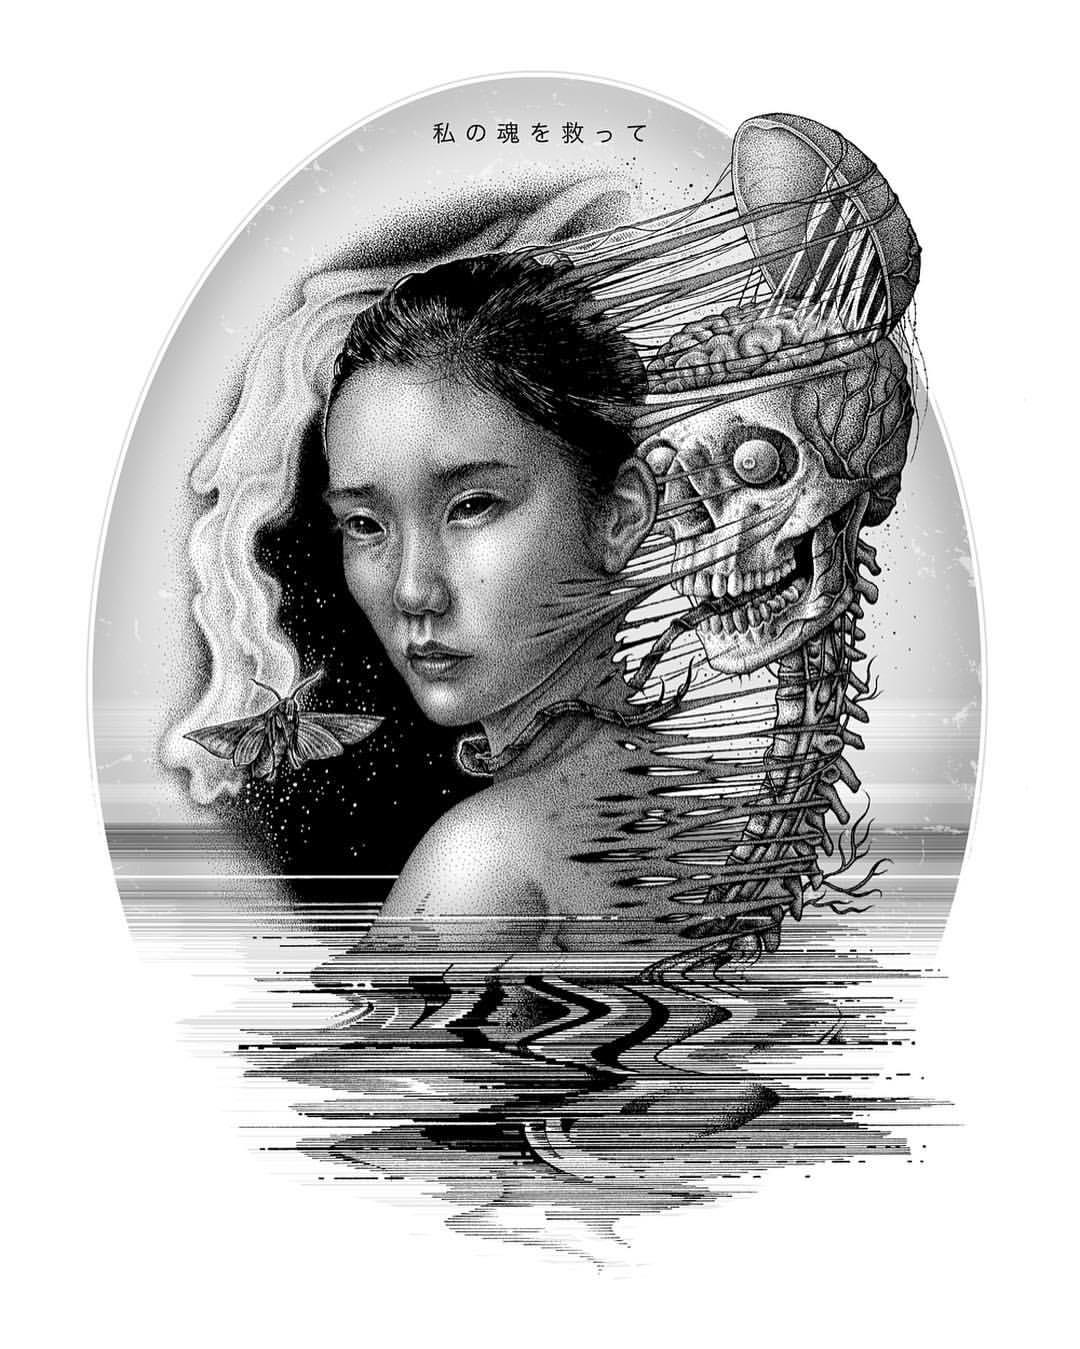 paul-jackson-ilustracao-desenho-dionisio-arte-10